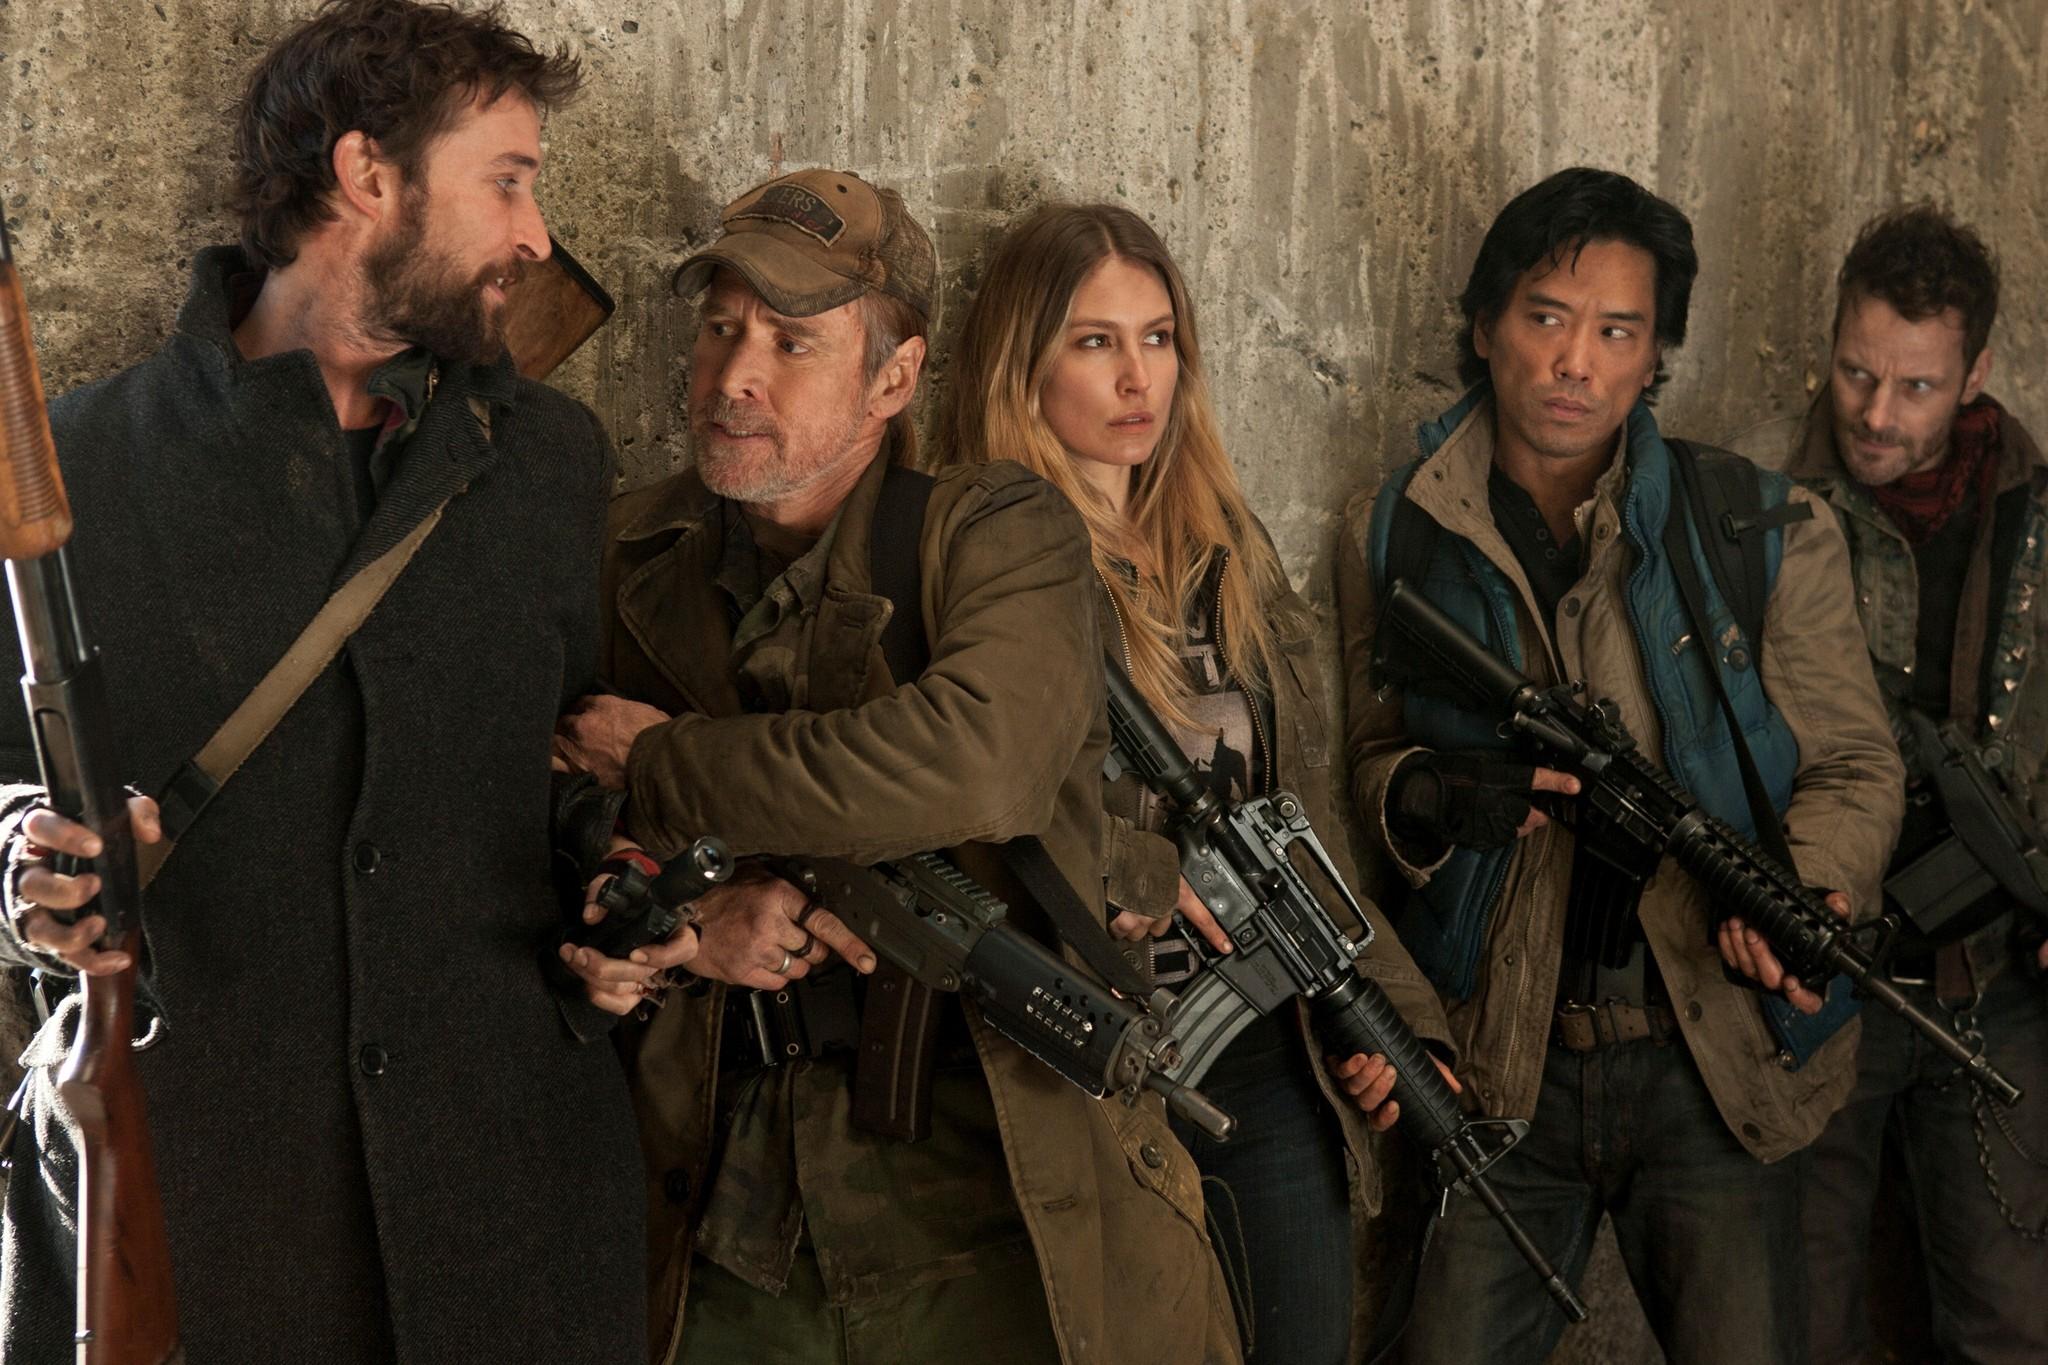 Will Patton, Noah Wyle, Sarah Carter, Ryan Robbins, and Peter Shinkoda in Falling Skies (2011)